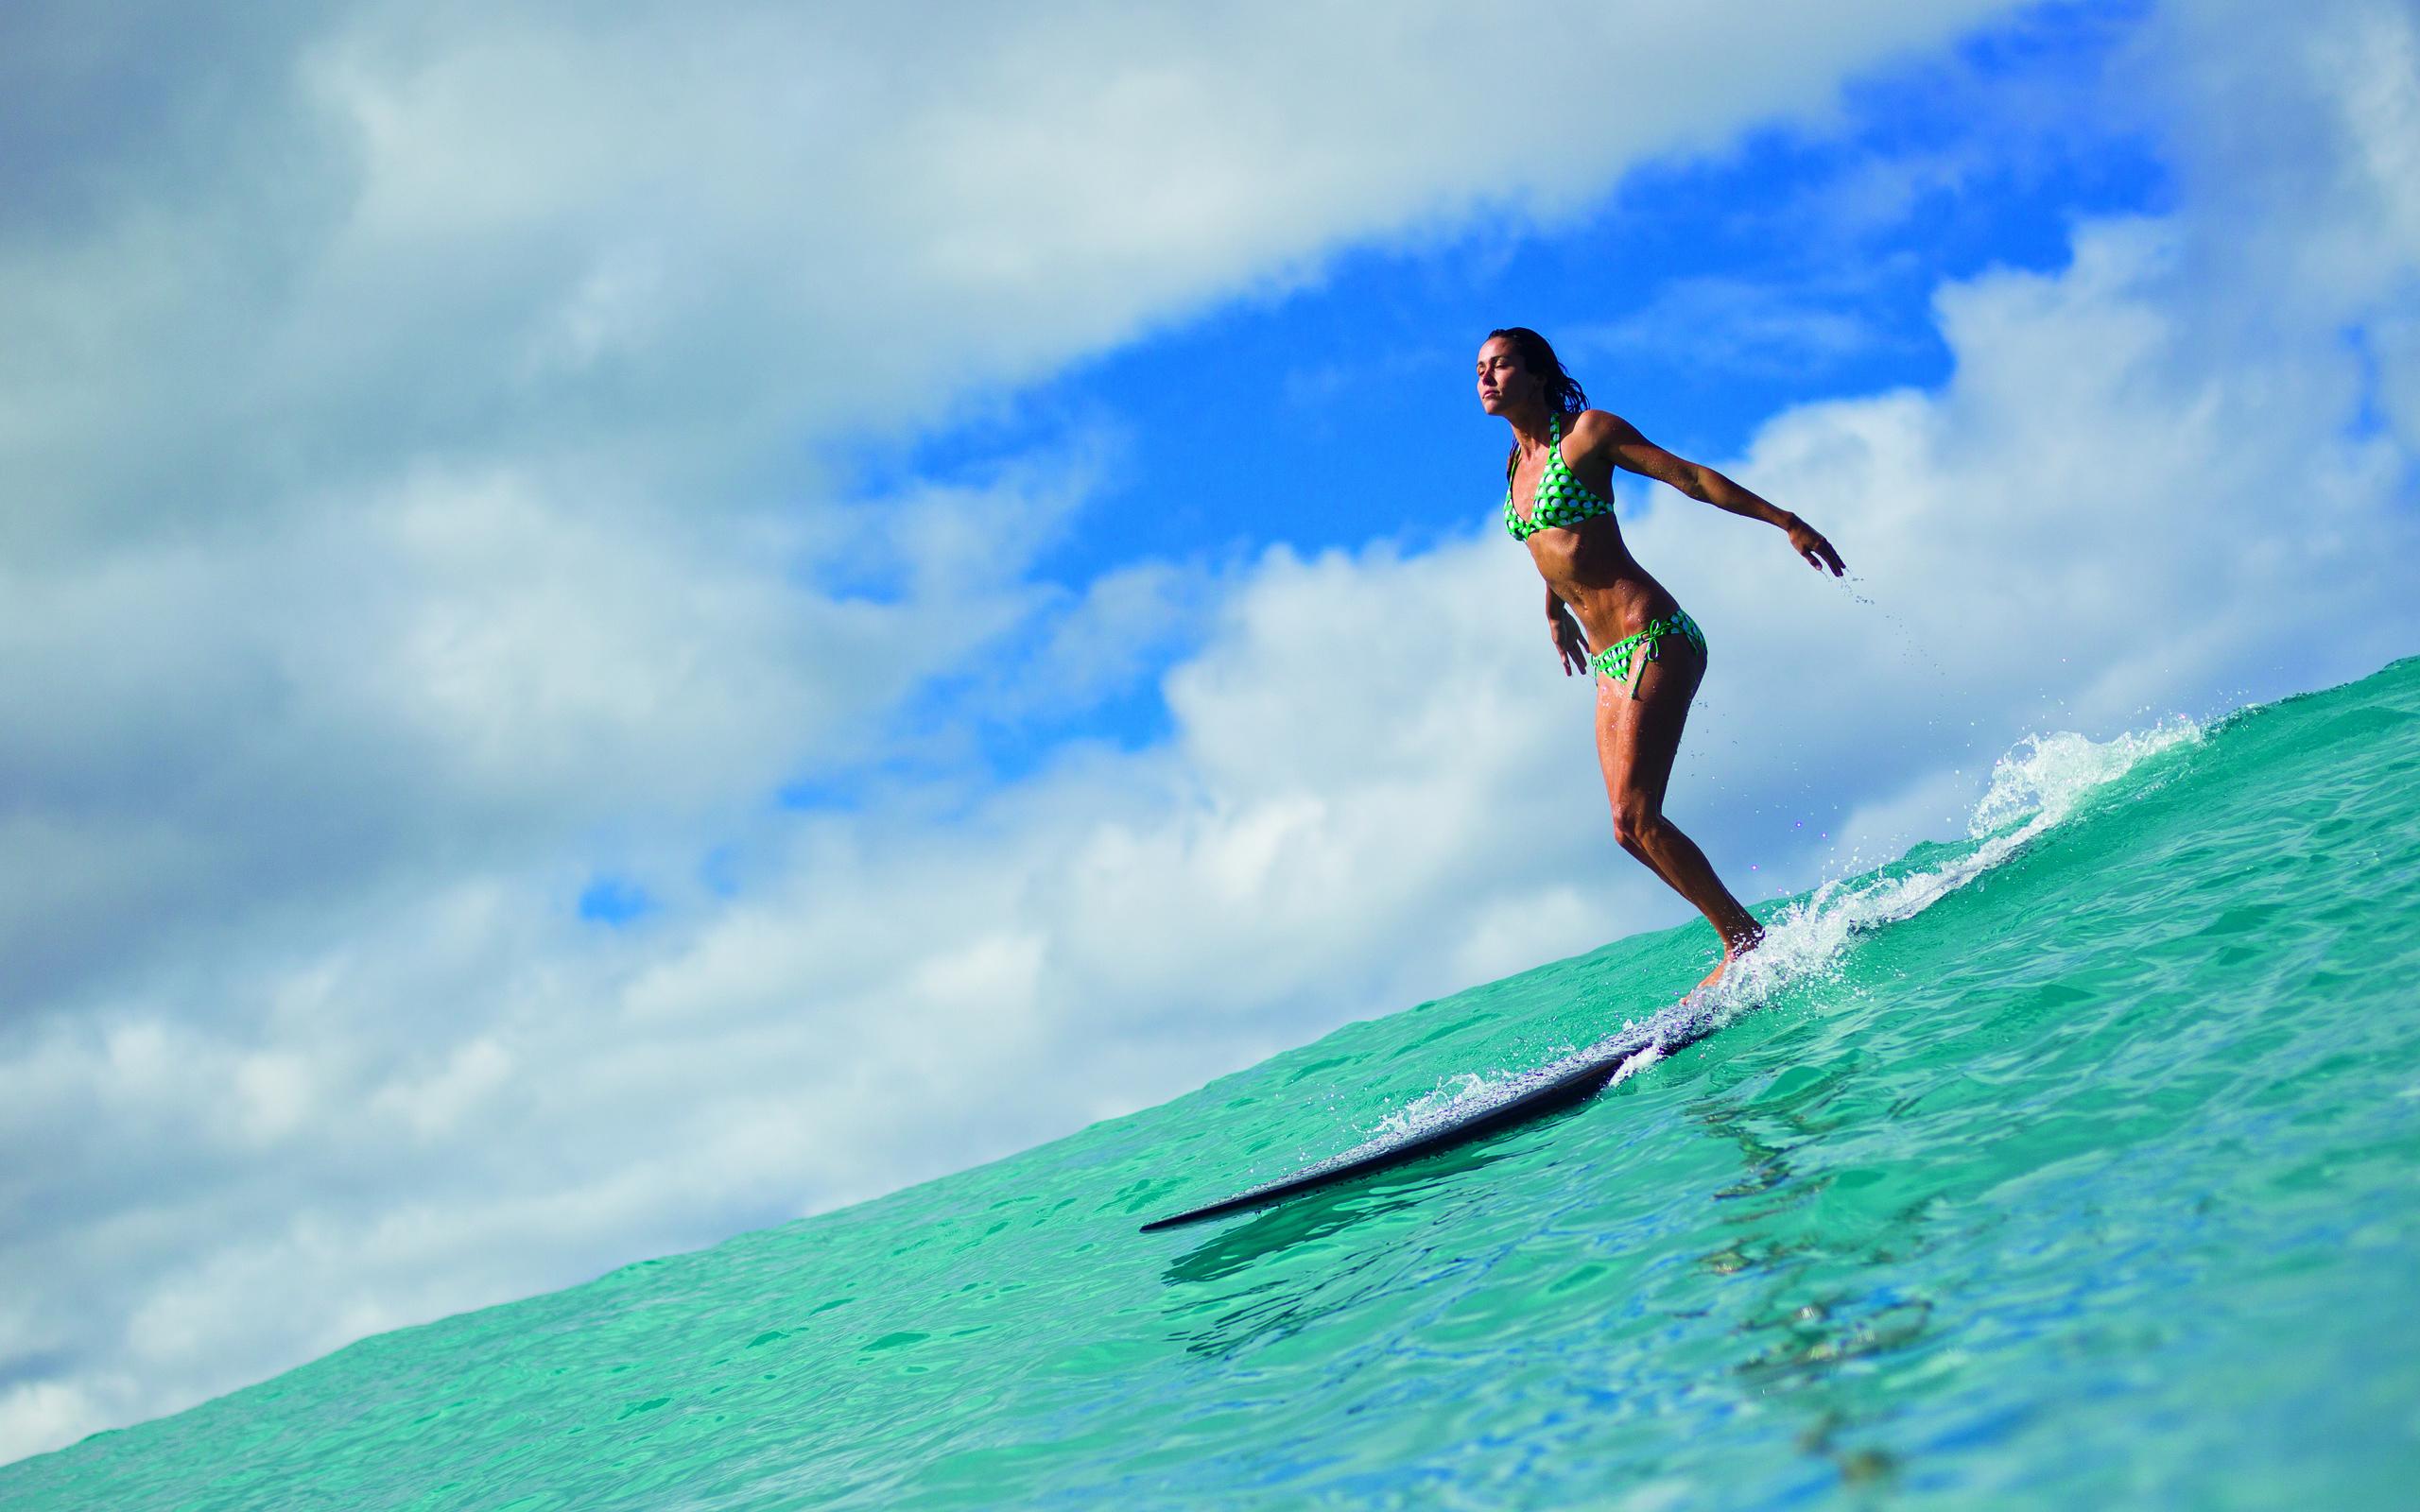 Фото девушек на фоне океана, Фото: Девушка на фоне океана 24 фотография